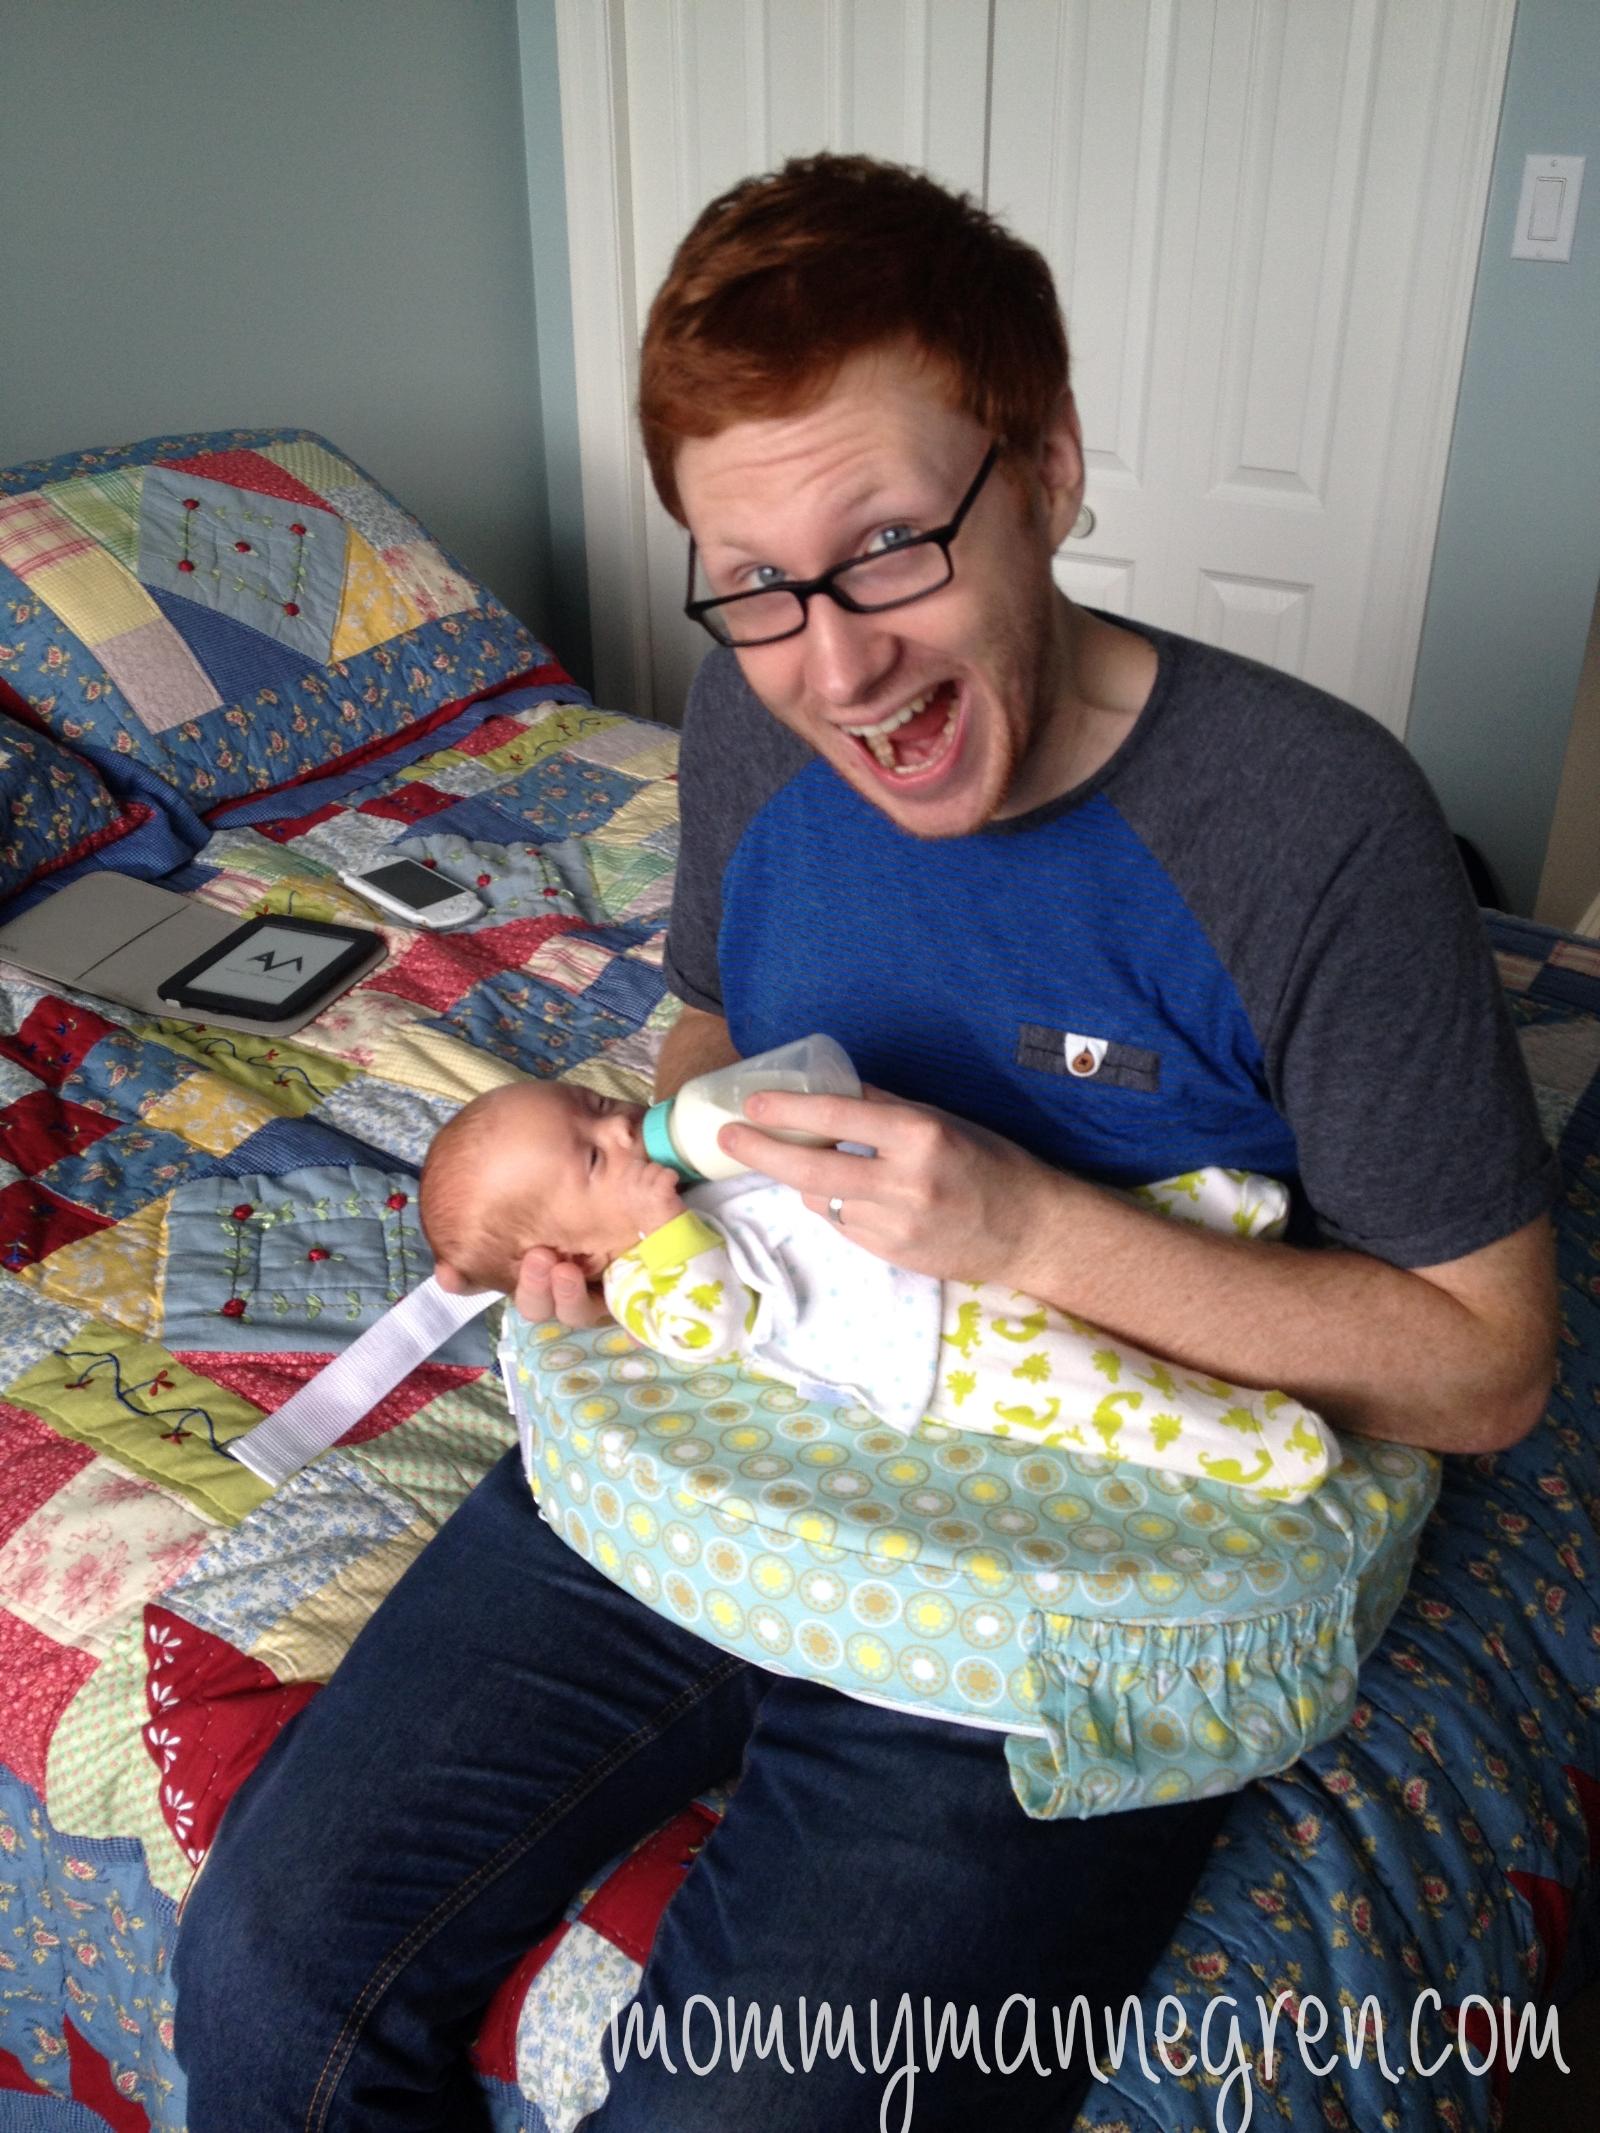 My Top Ten Favourite Baby Gear Mommy Mannegren